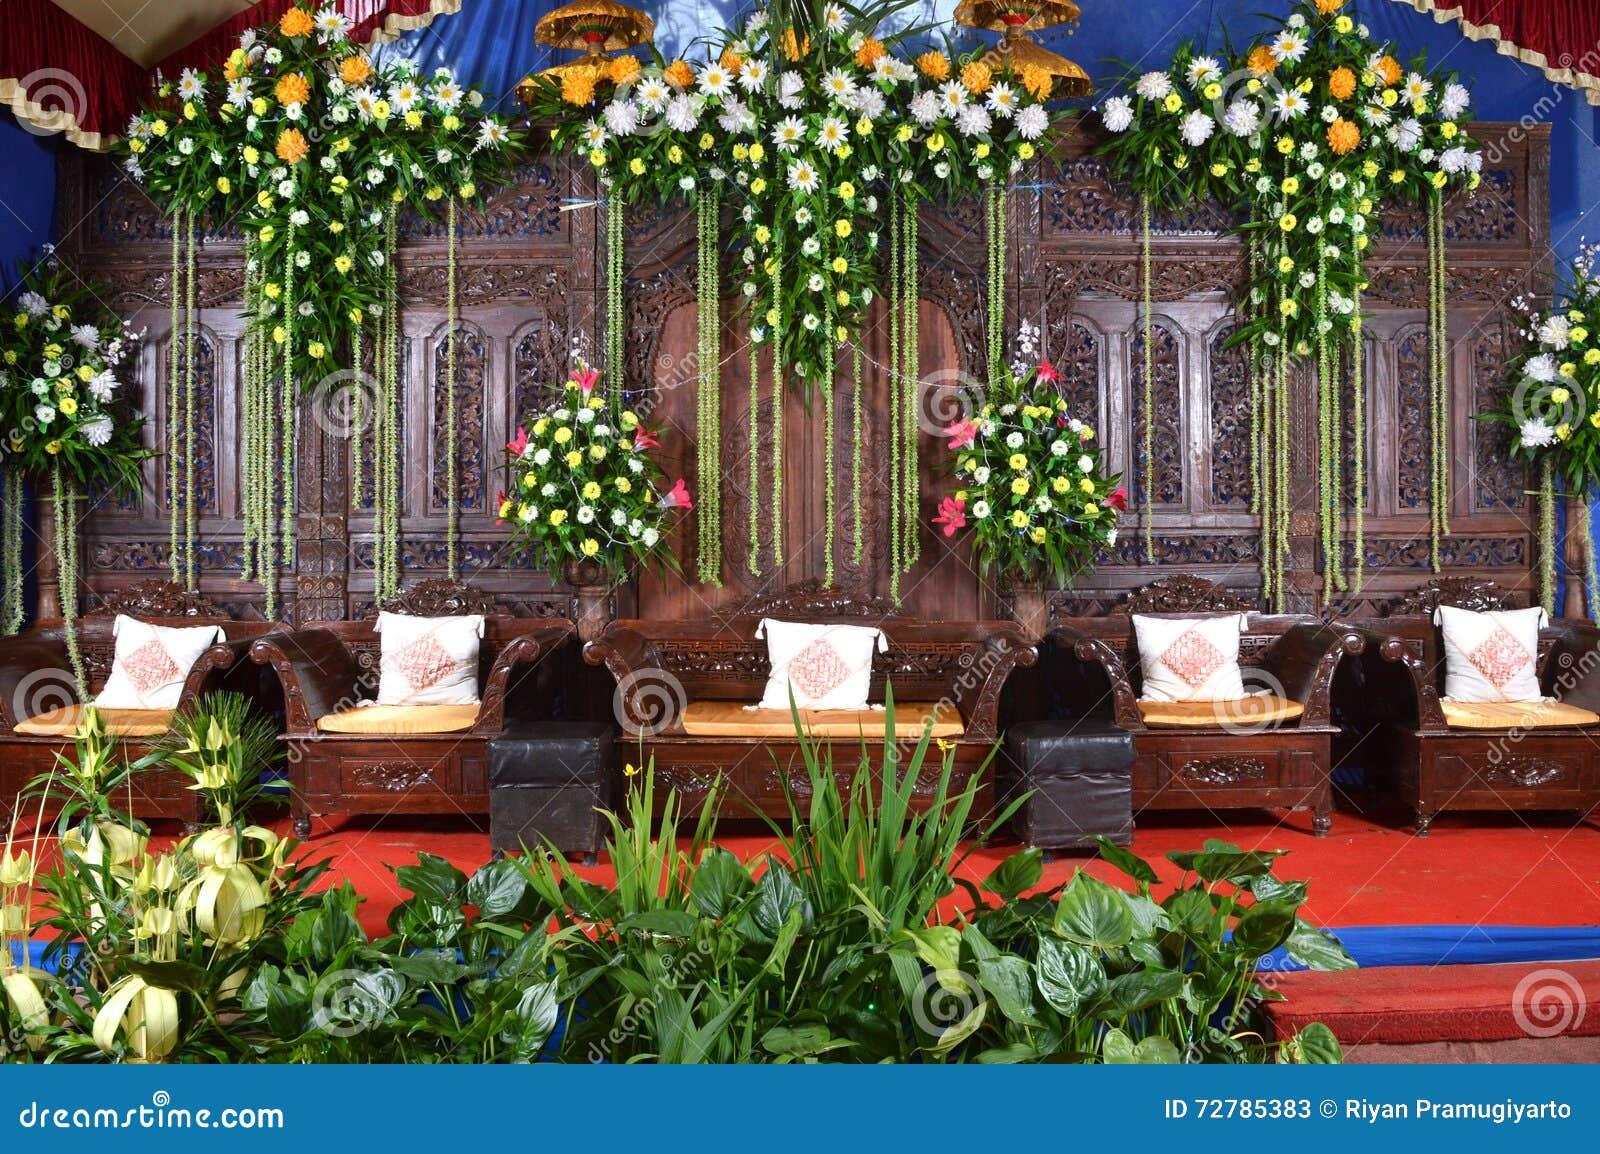 Java Wedding Decoration Dekorasi Pernikahan Jawa Stock